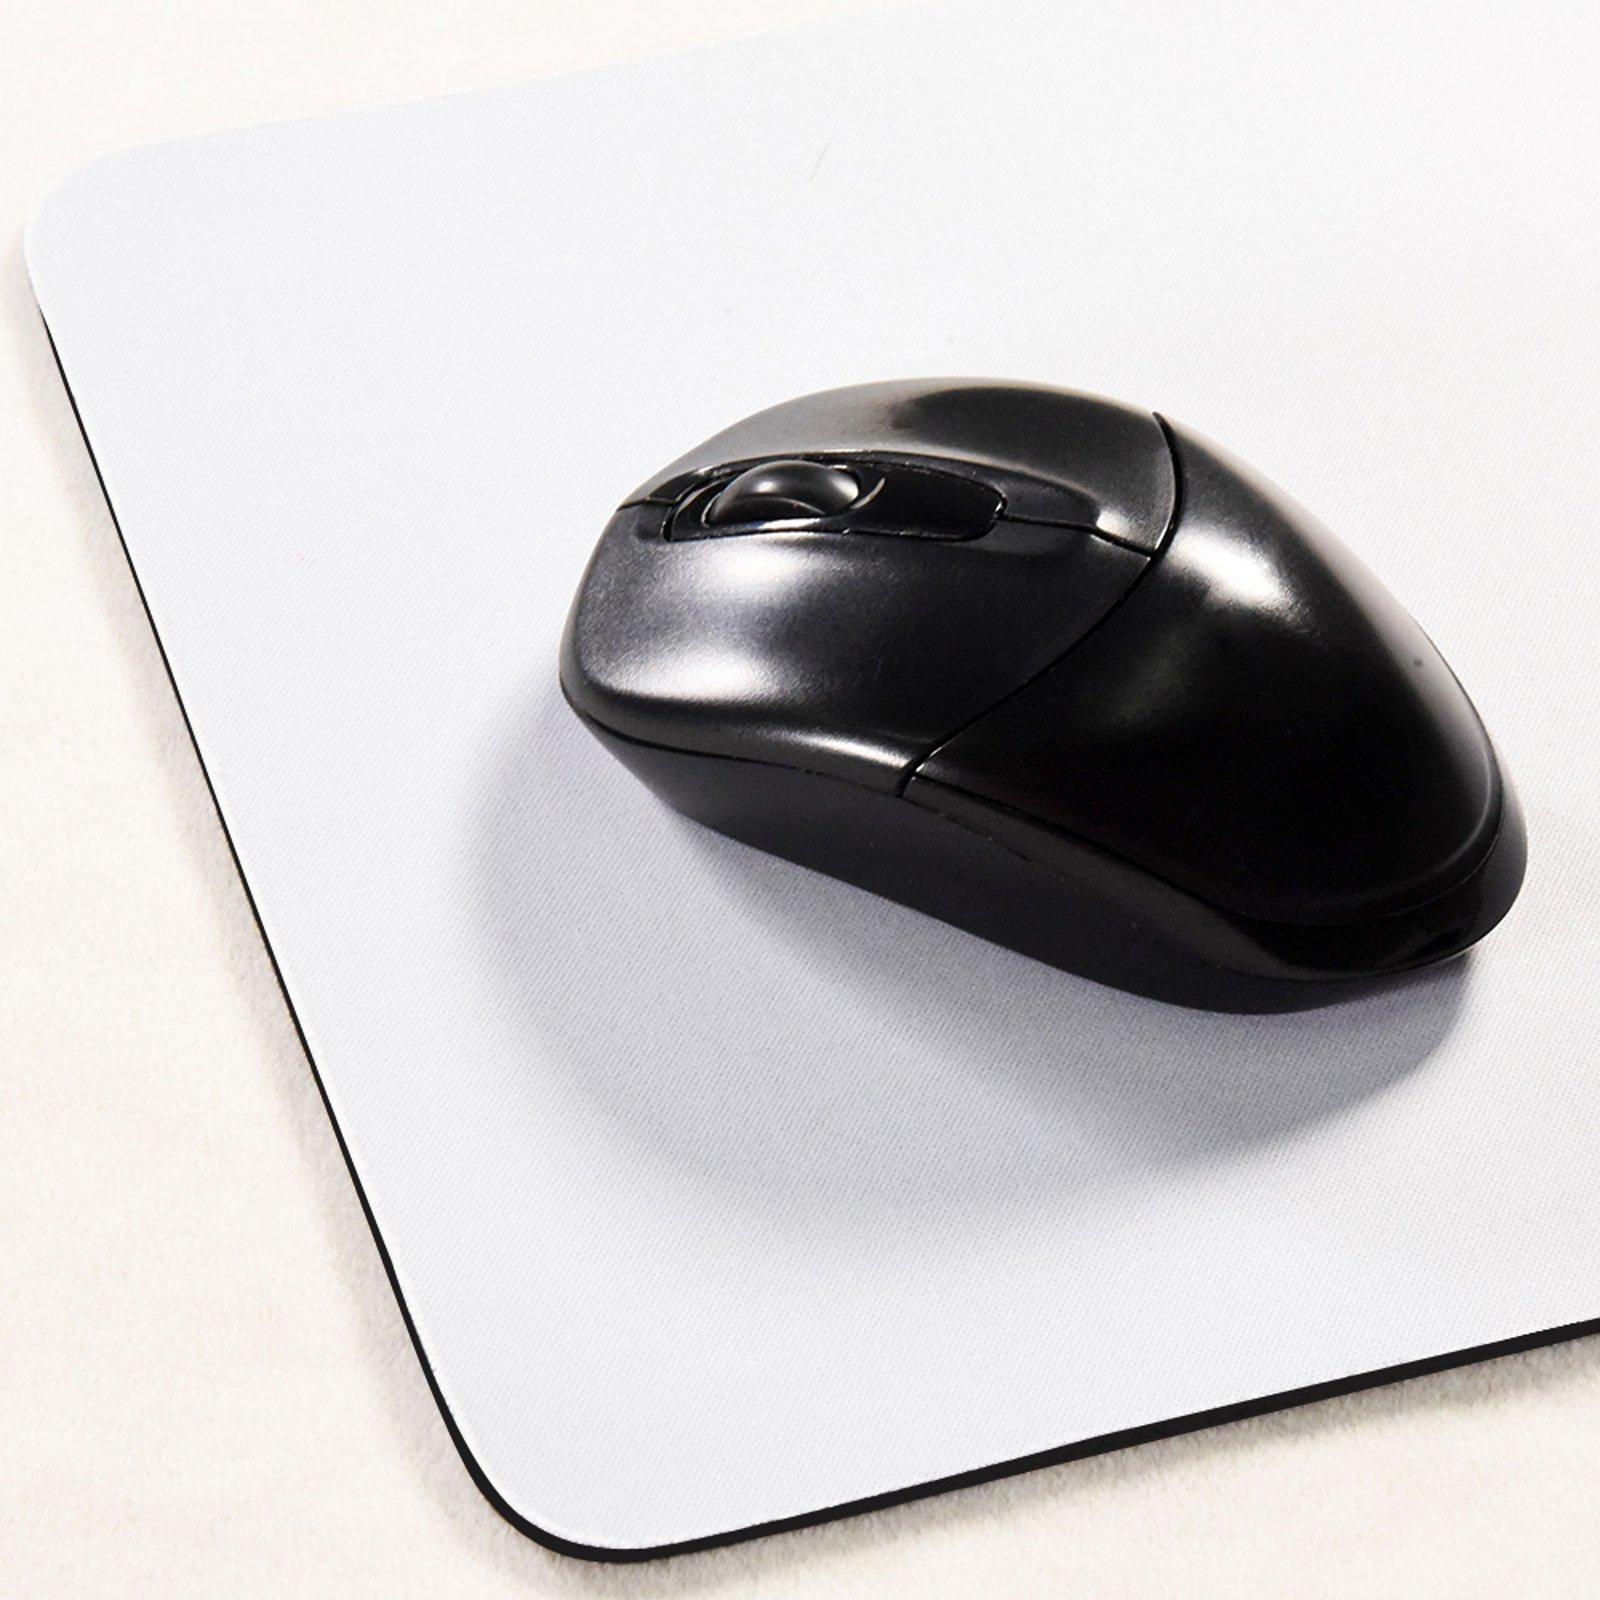 H5587cbb124c74784a92dd6eec5cdd481G - Anime Mousepads